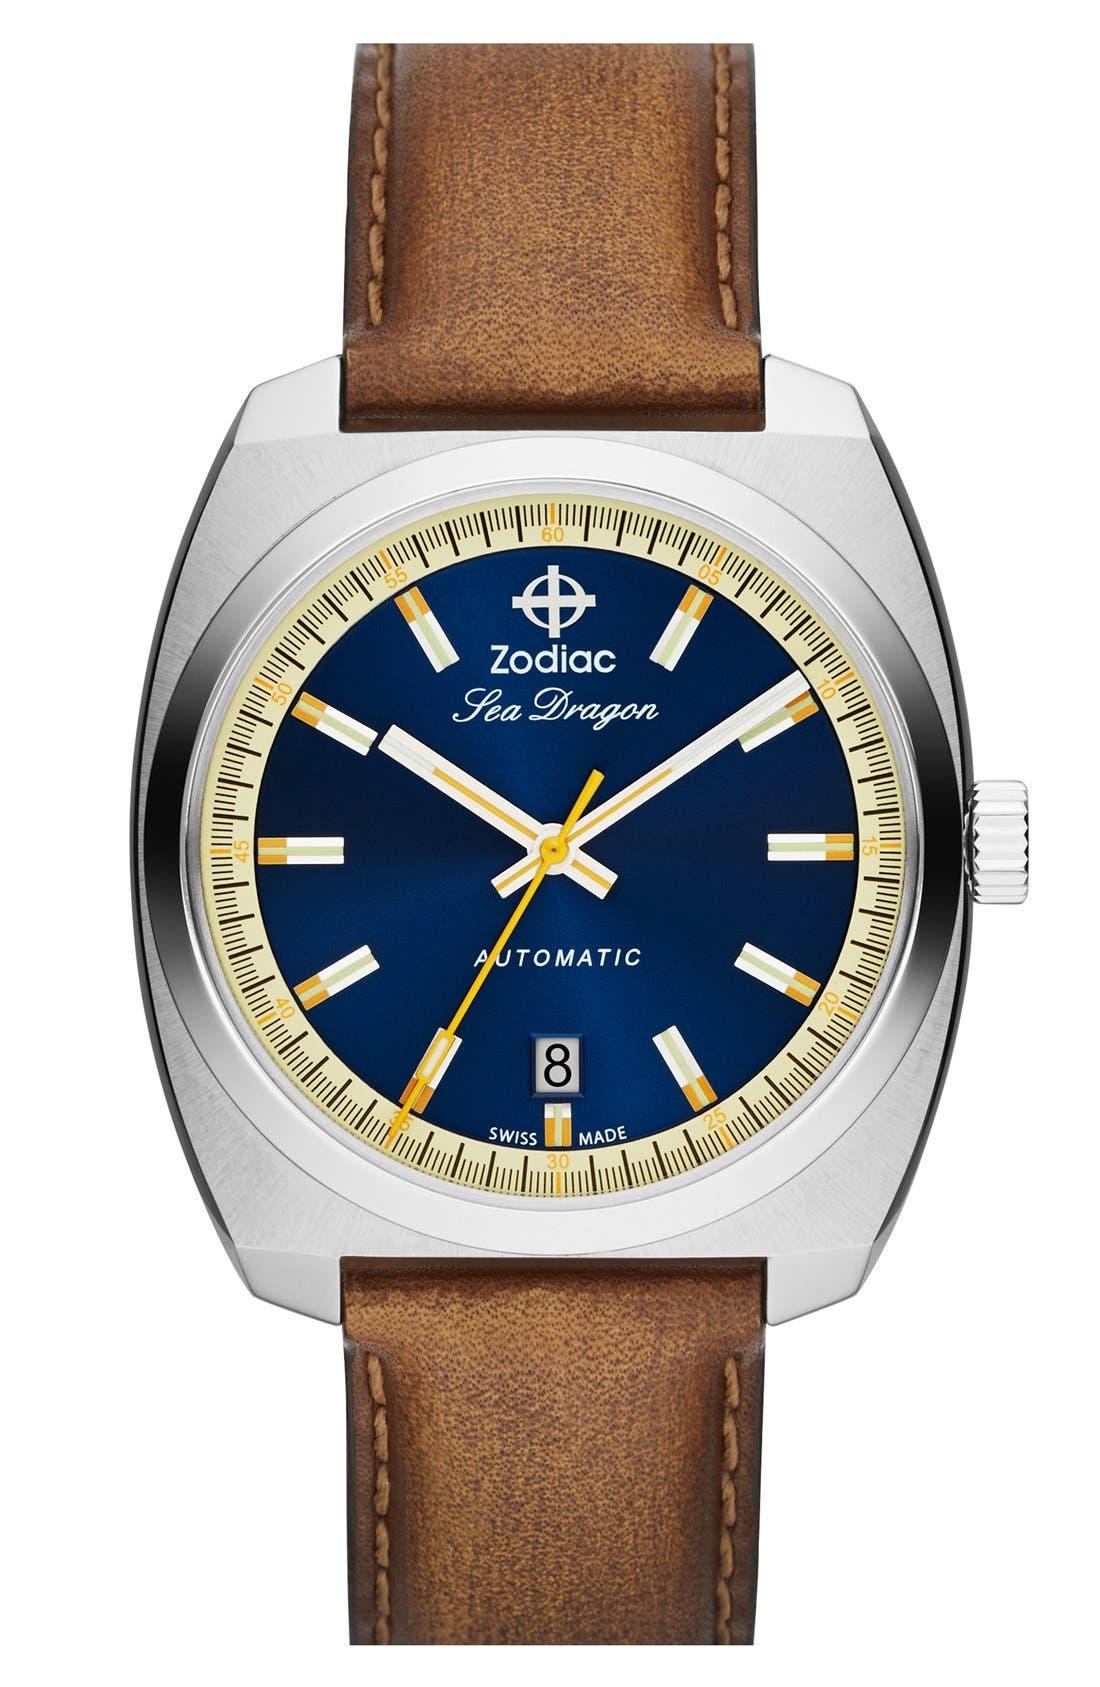 Main Image - Zodiac 'Sea Dragon' Automatic Leather Strap Watch, 39mm